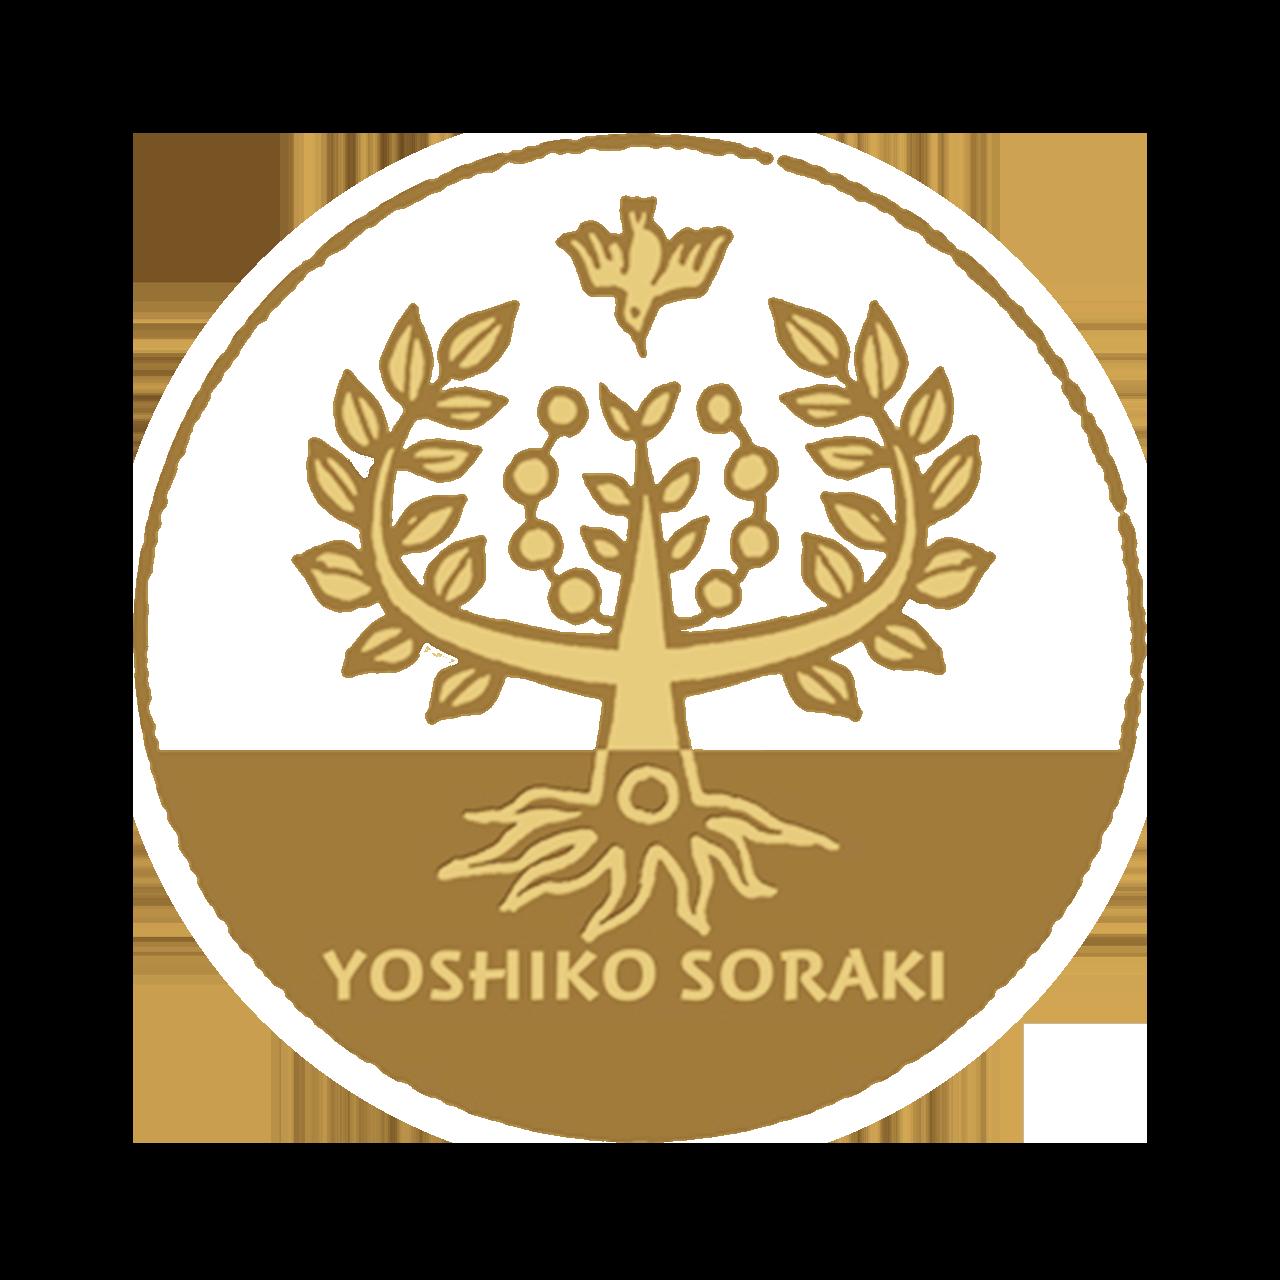 soraki_image_logo